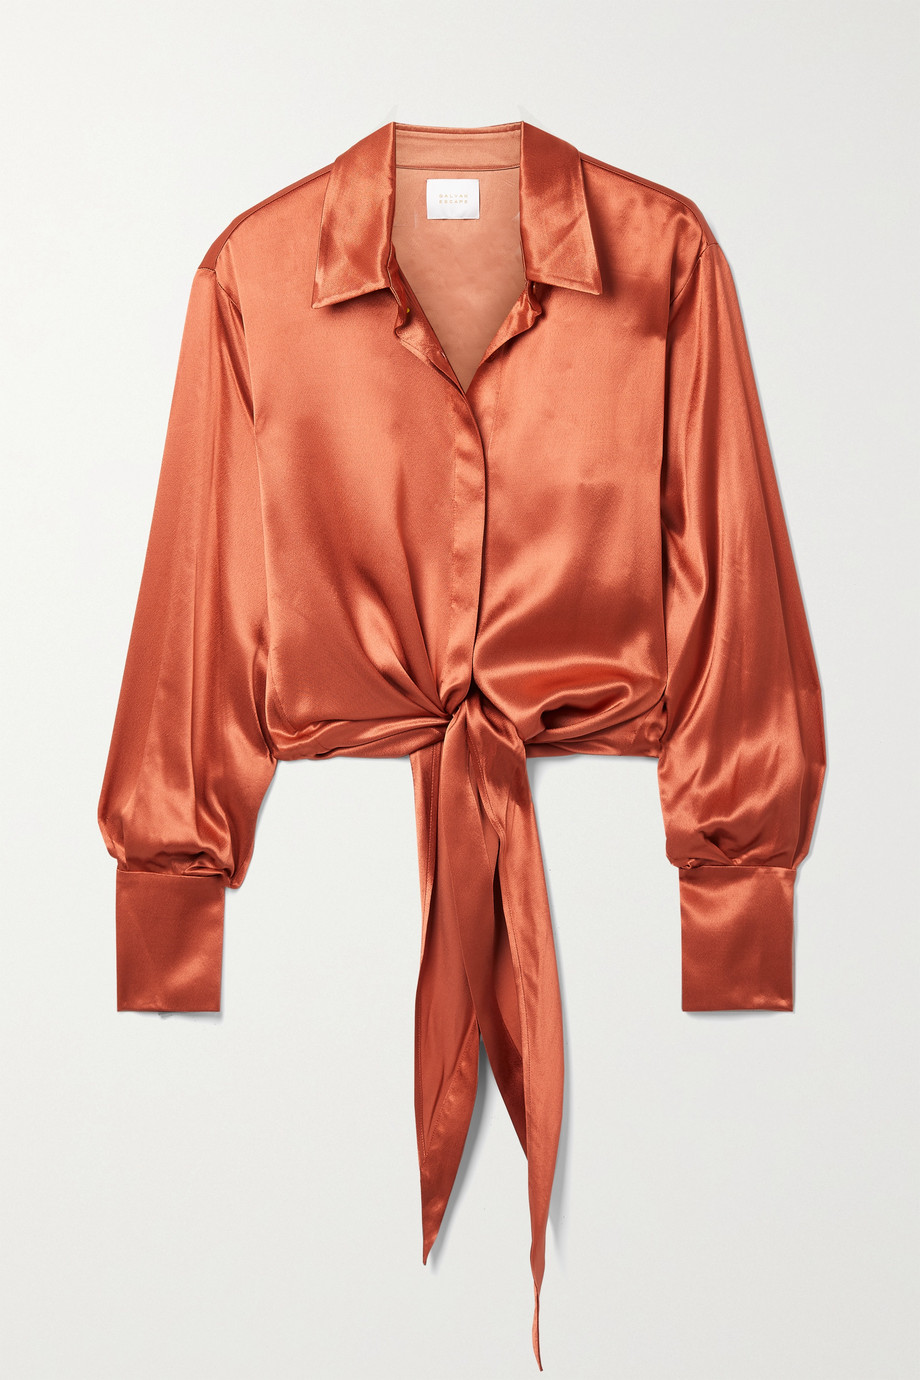 Galvan Lido tie-front satin blouse